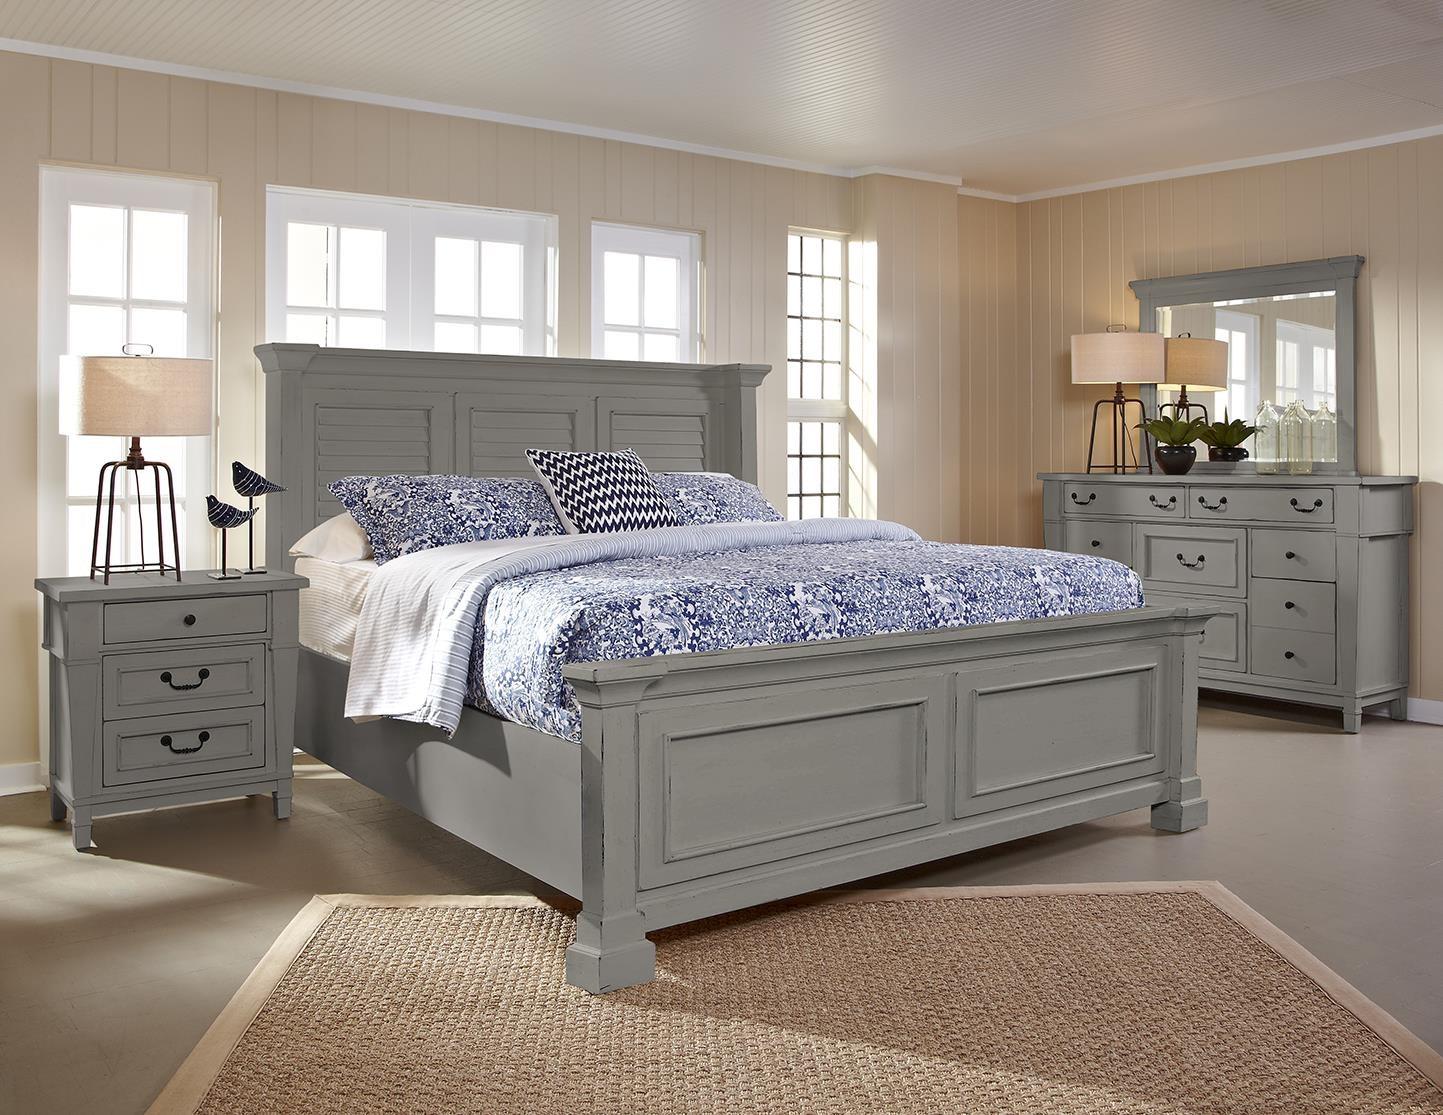 King  Shutter Panel Bed Dresser, Mirror,  3